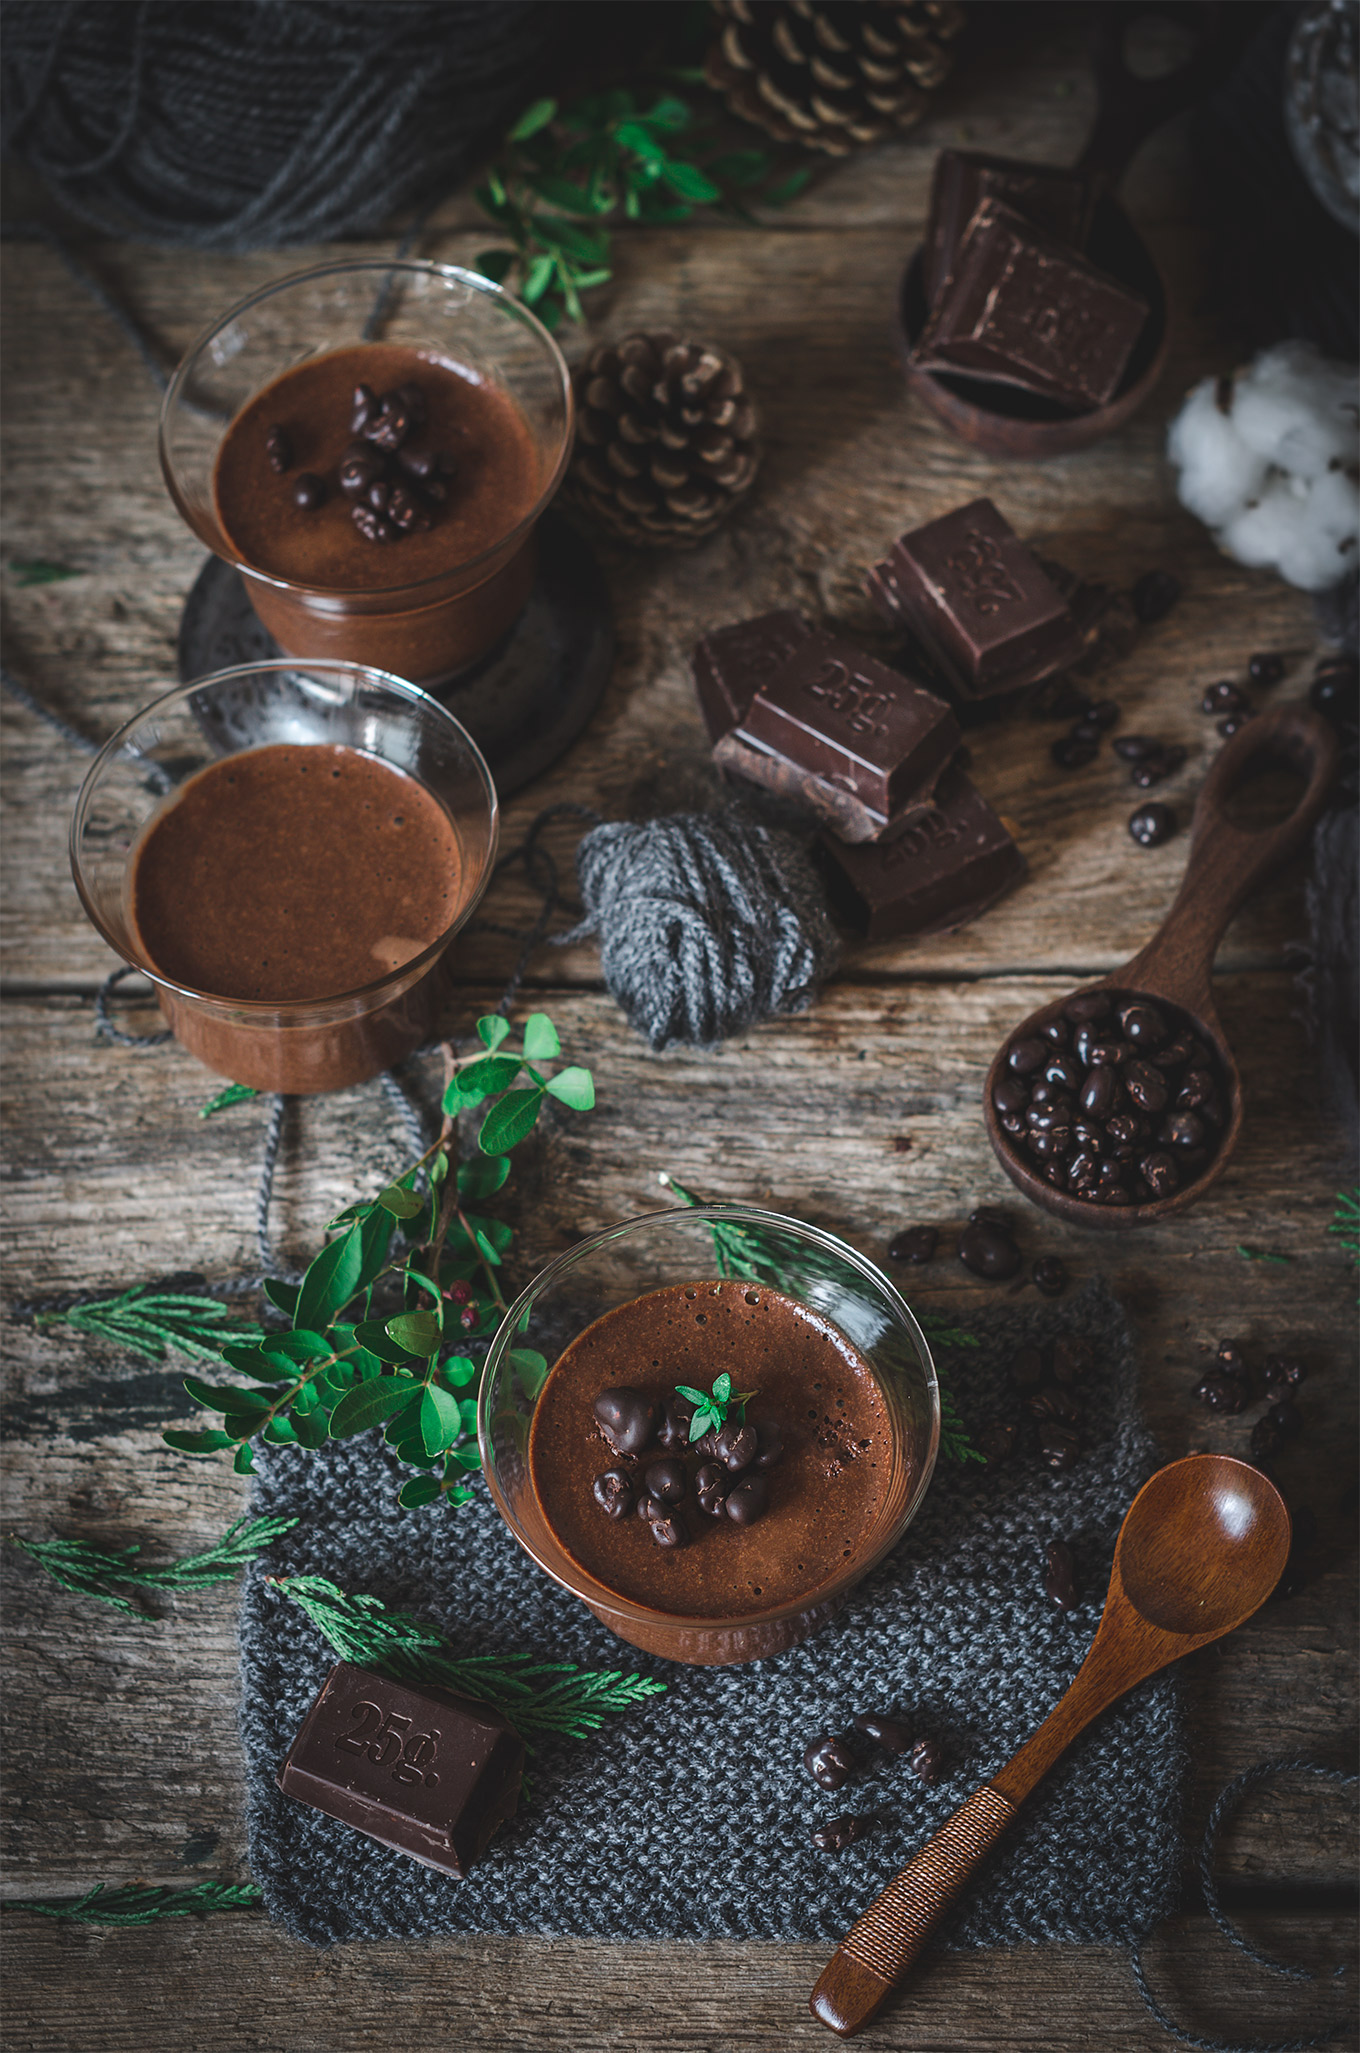 Mousse de chocolate y Caramelo salado